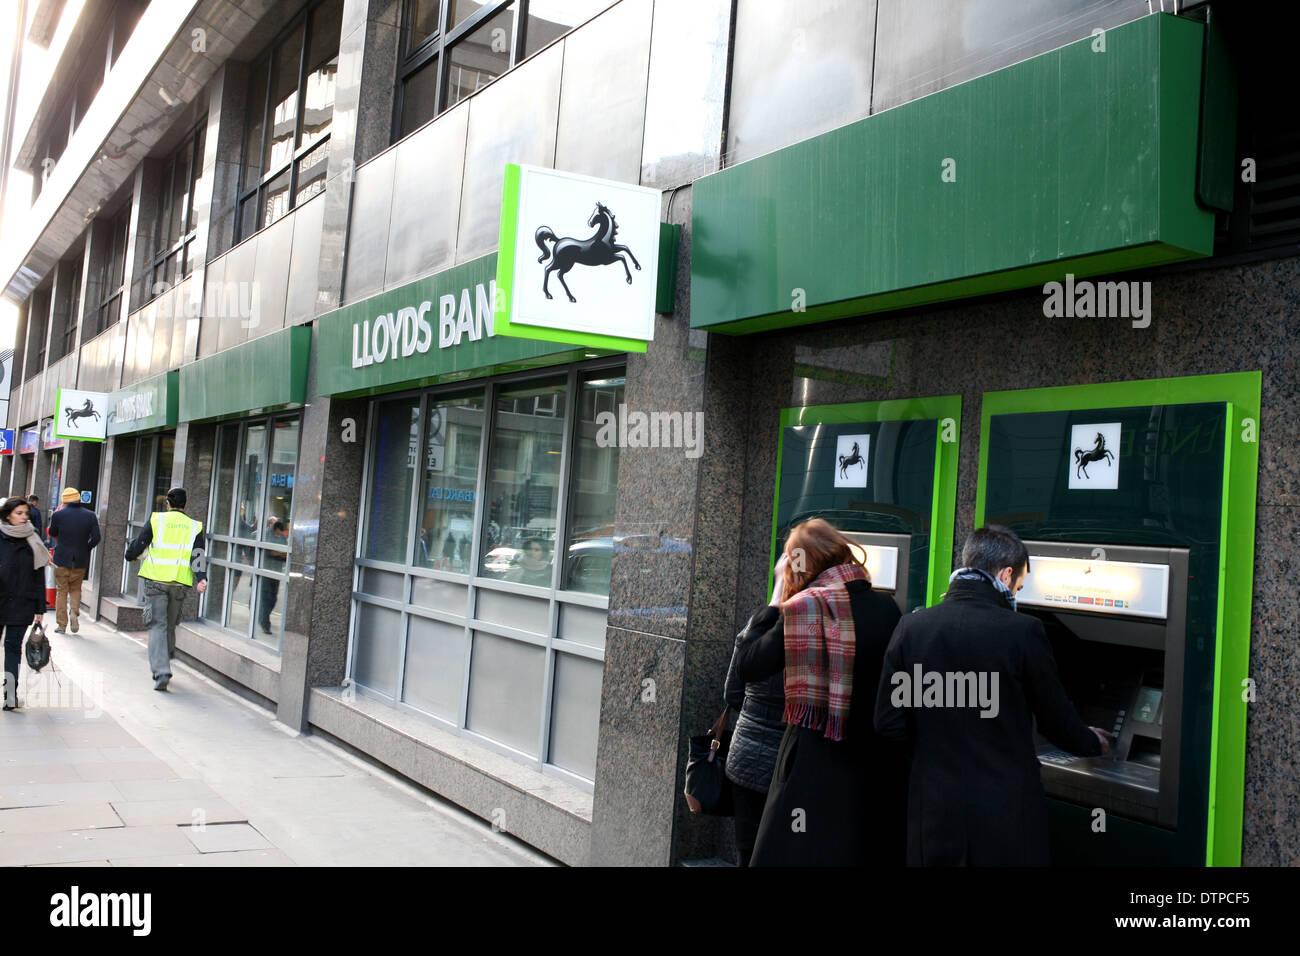 Lloyds Online Banking Stock Photos & Lloyds Online Banking Stock ...